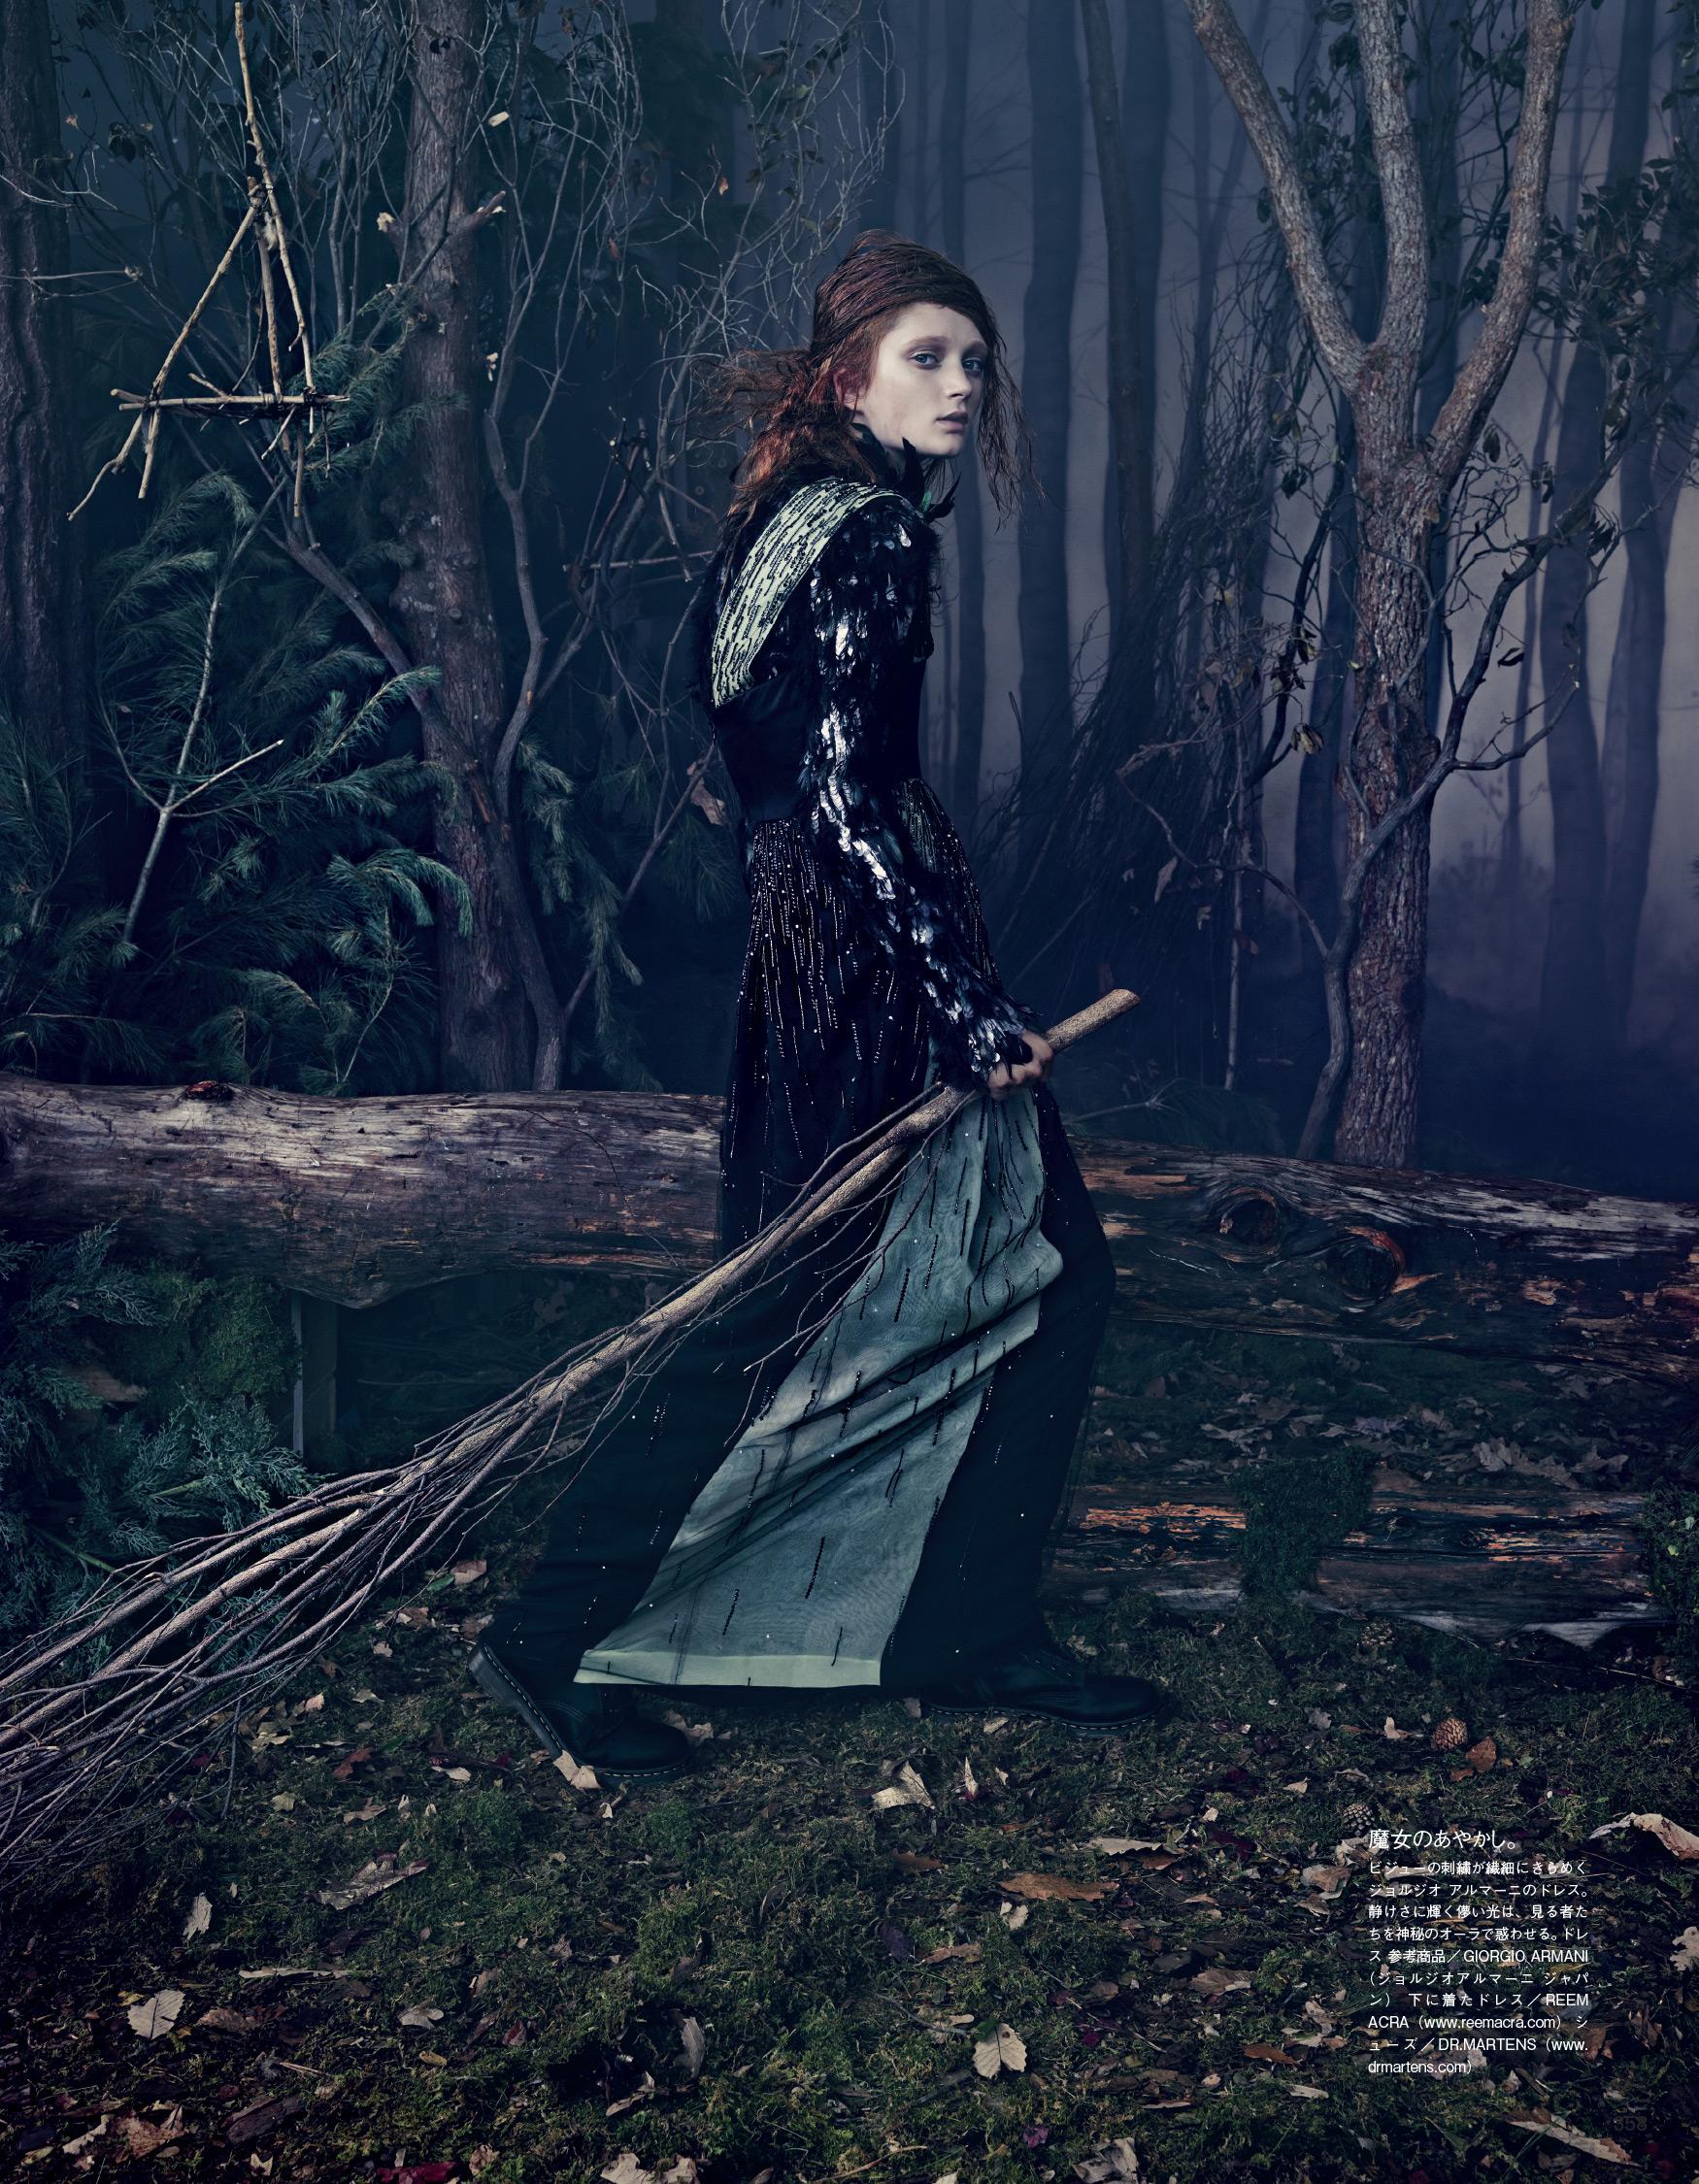 Giovanna-Battaglia-Into-The-Woods-Vogue-Japan-Emma-Summerton-07.jpg